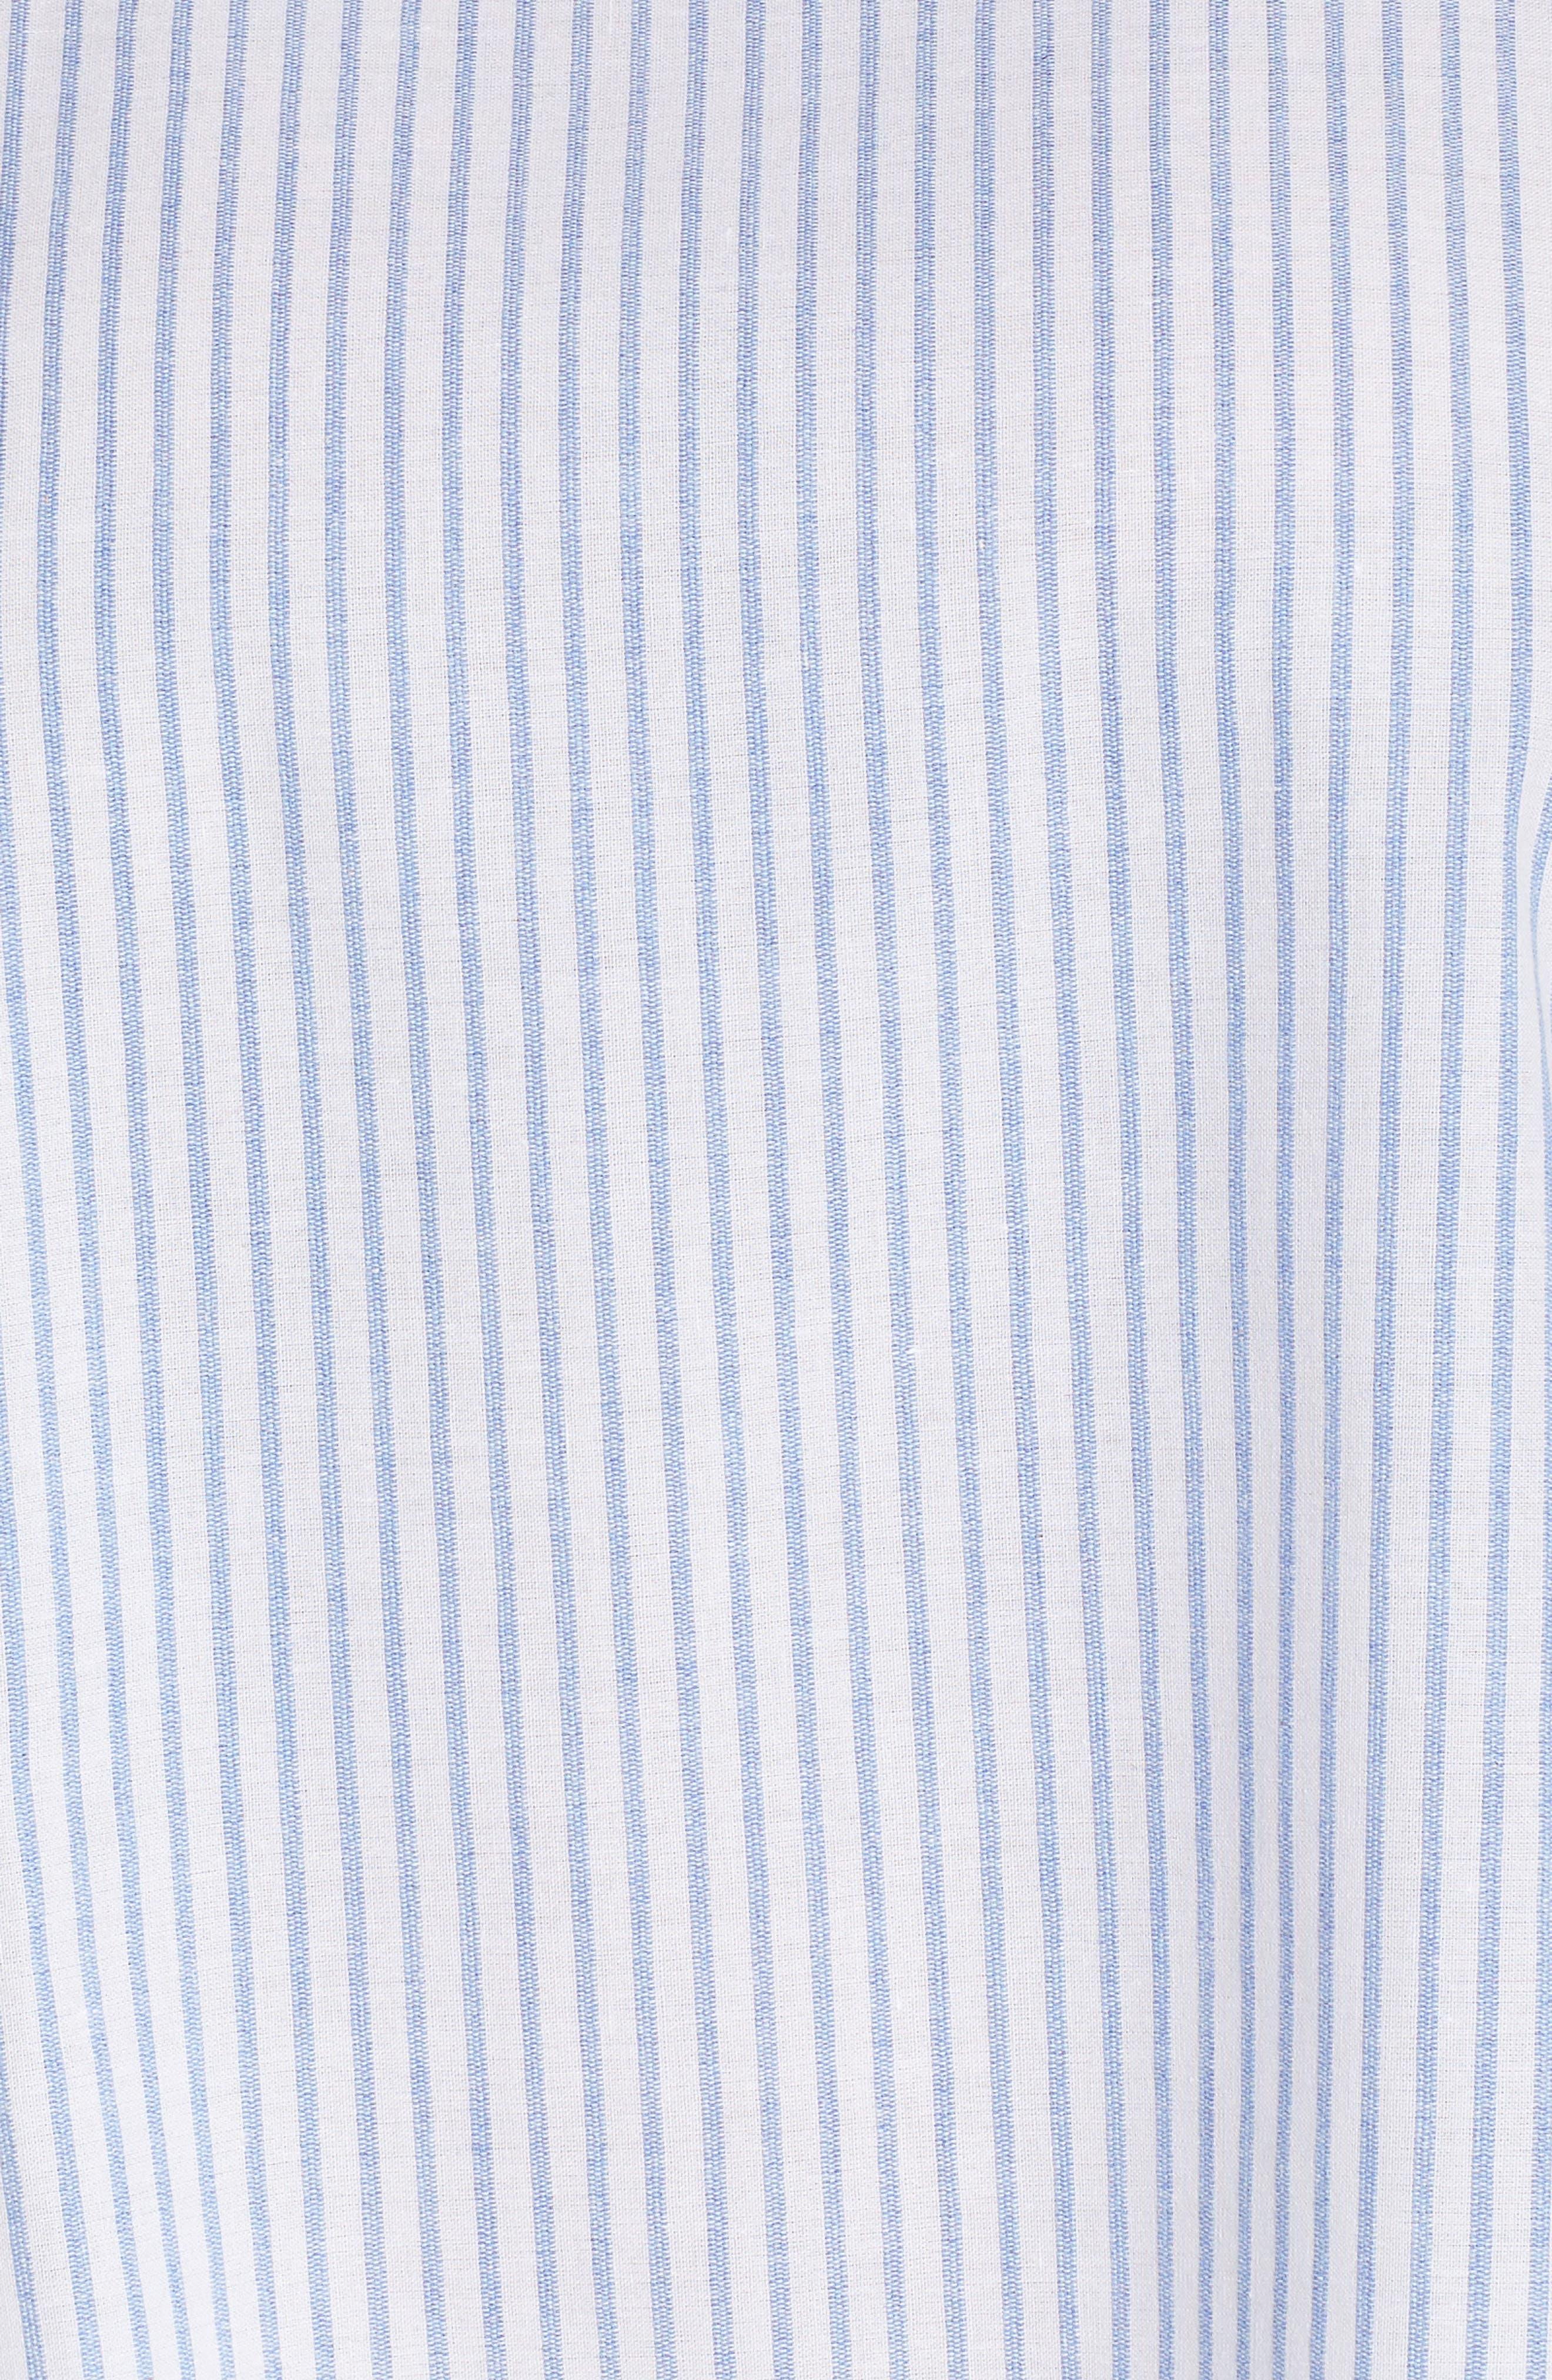 Cold Shoulder Stripe Top,                             Alternate thumbnail 6, color,                             Stripe Print